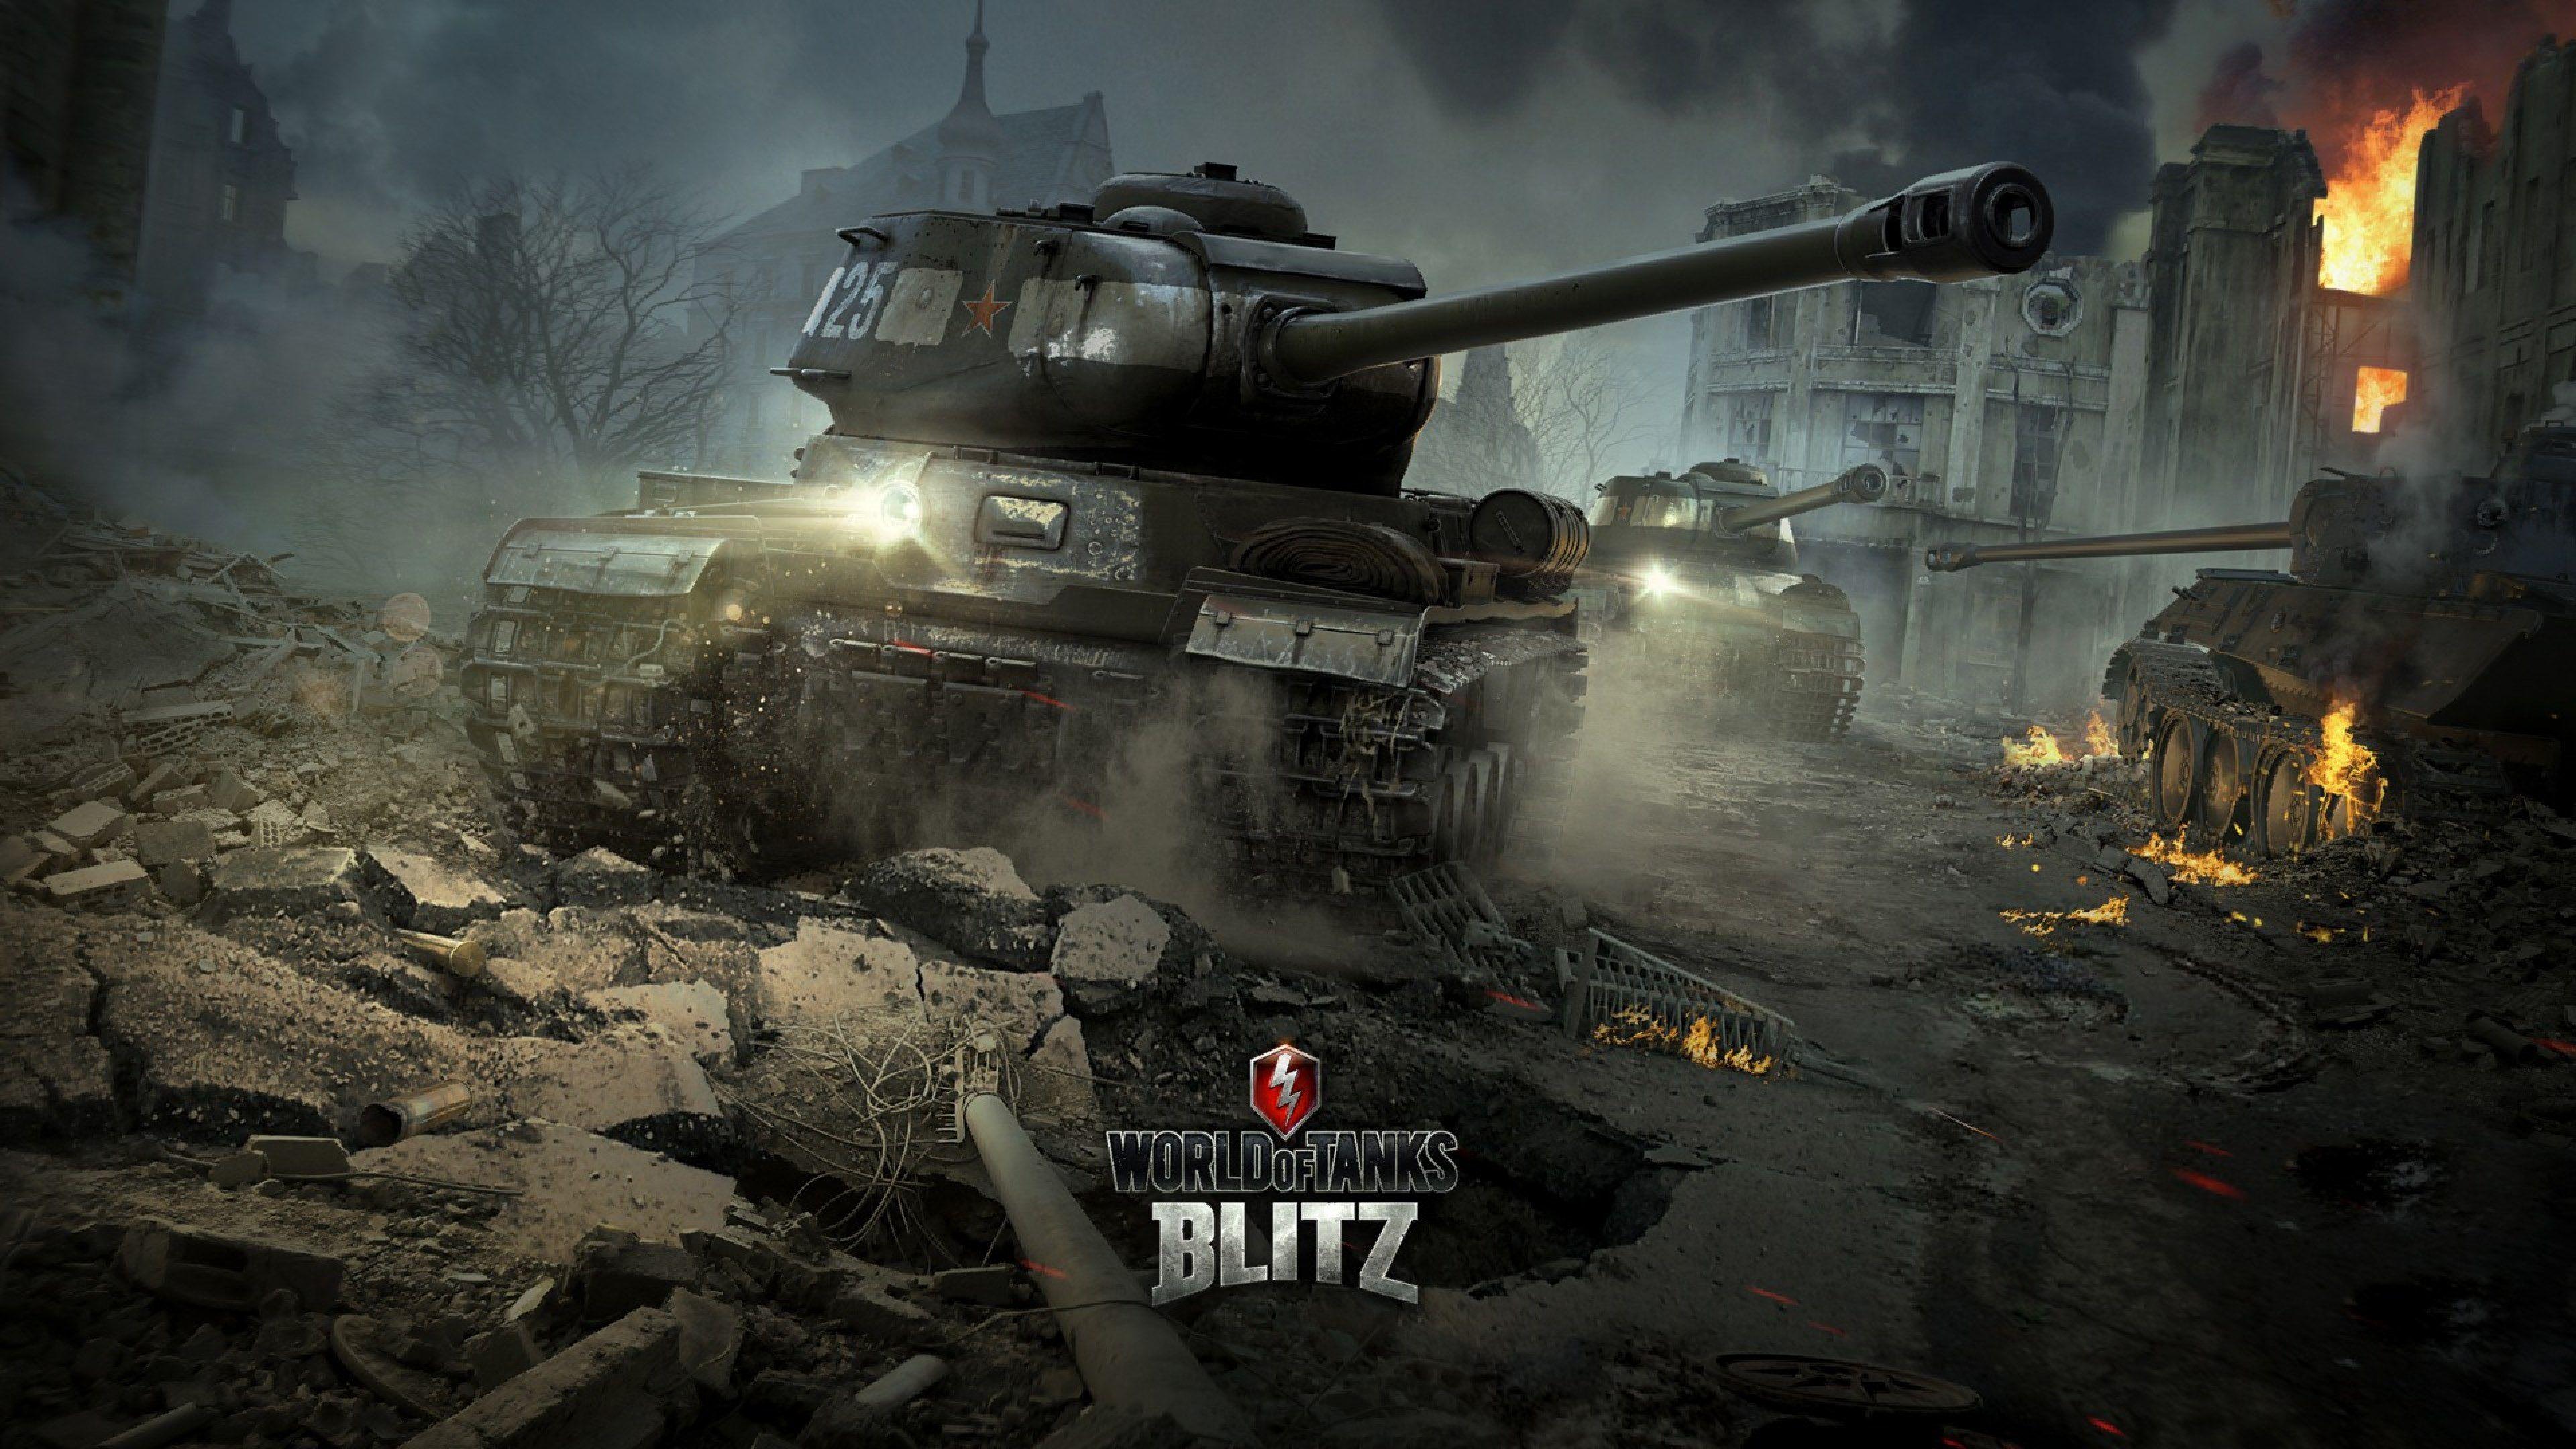 3840x2160 World Of Tanks 4k Wallpaper Hd For Pc 예술